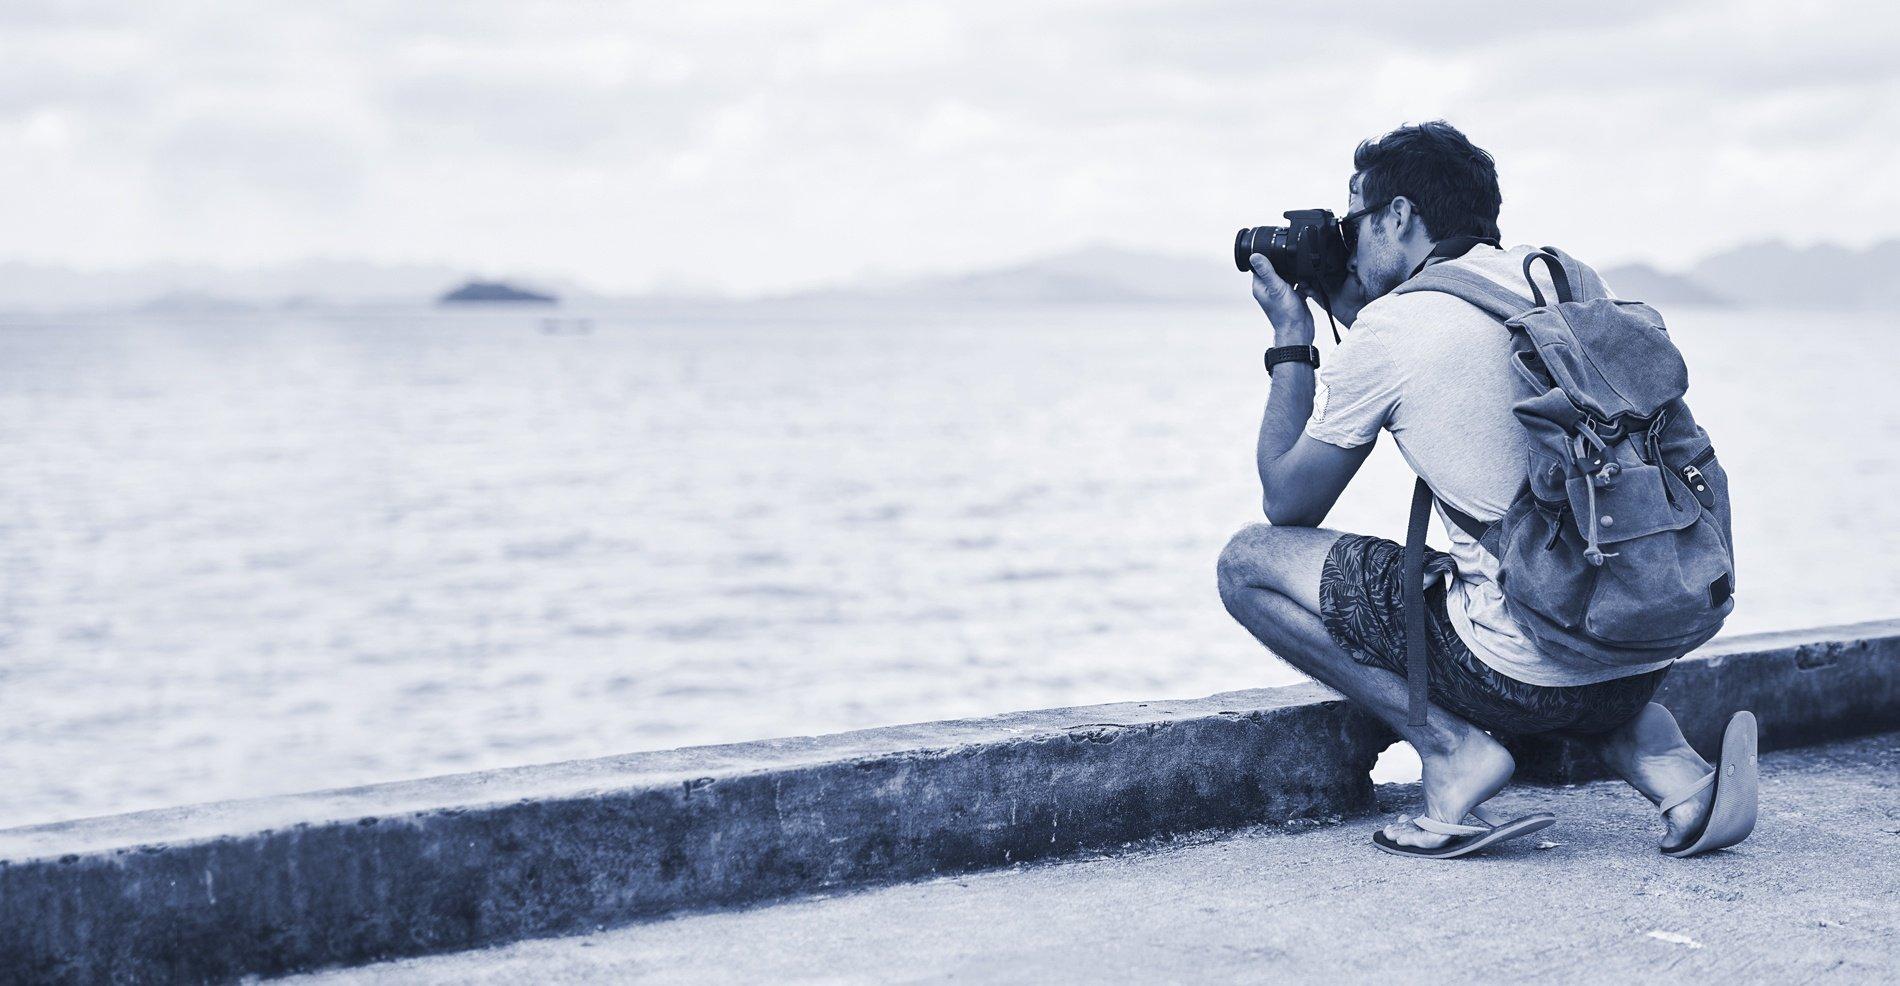 BLOG_DUO_photographer_water_lake_man_backpack_iStock-639577902